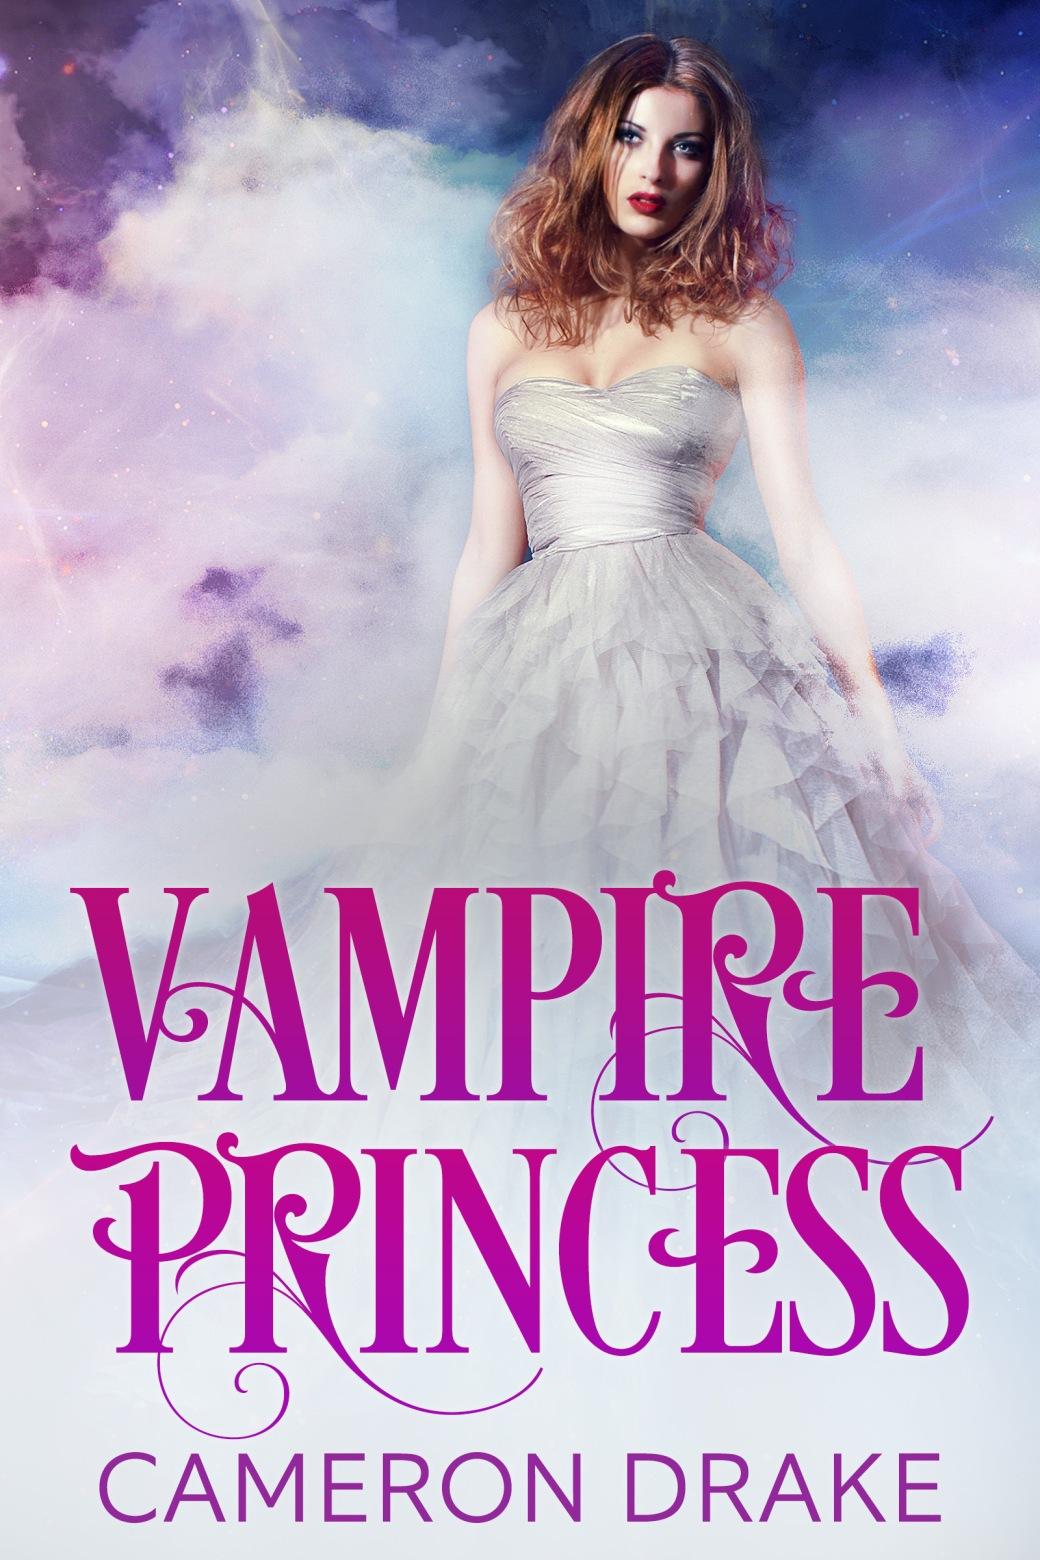 VAMPIRE PRINCESS EBOOK COMPLETE